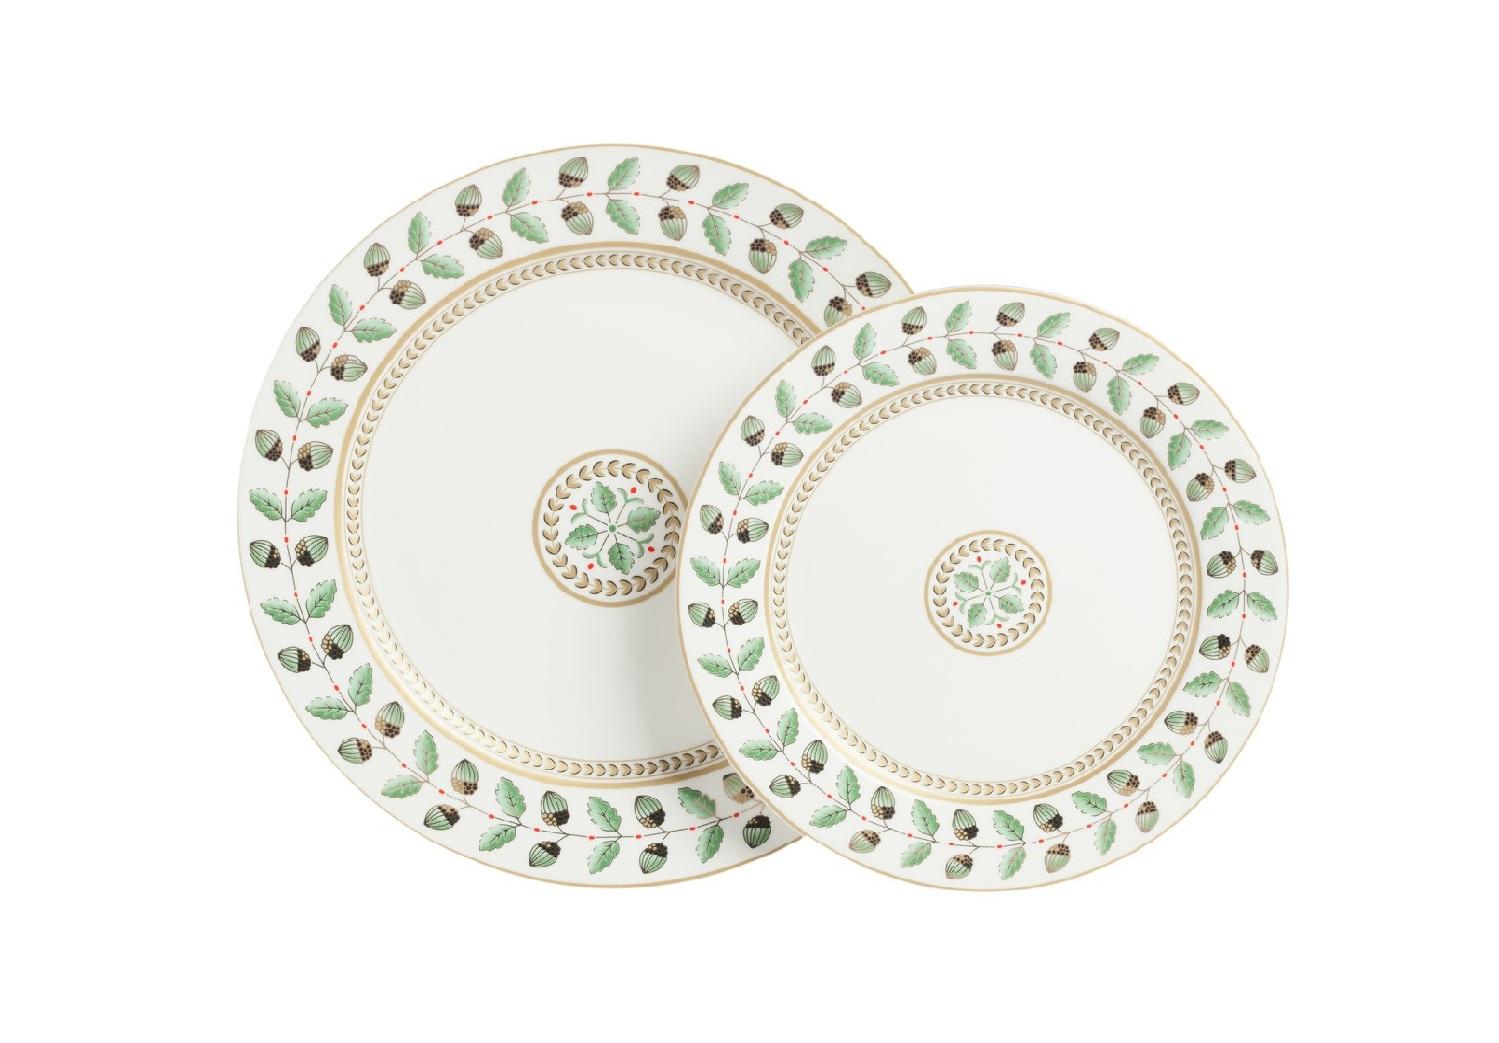 Комплект тарелок FloberДекоративные тарелки<br>Размеры: D25,5 см, D20 см<br><br>Material: Фарфор